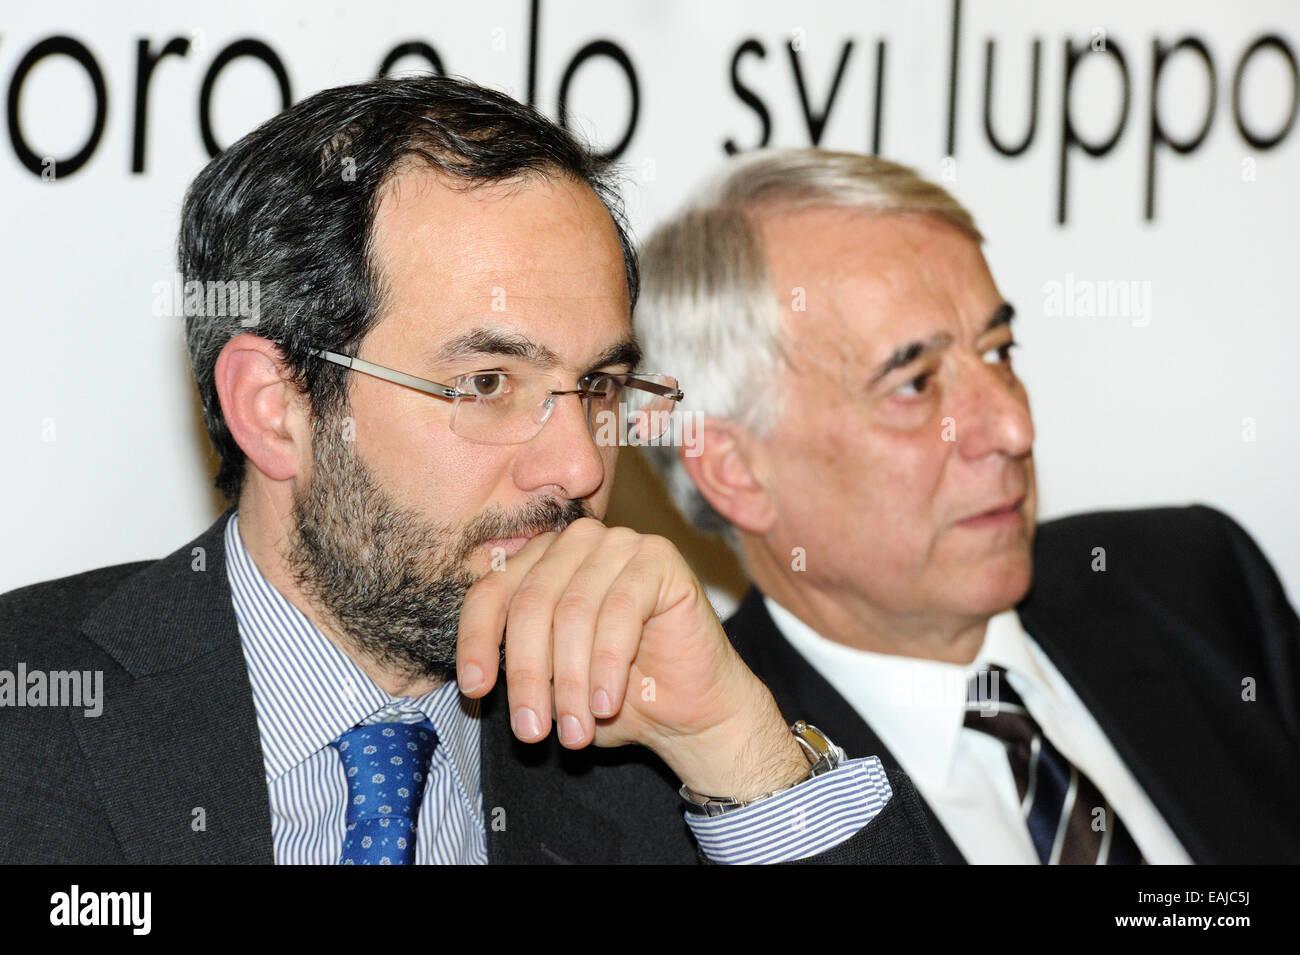 Umberto Ambrosoli e Giuliano Pisapia - Stock Image